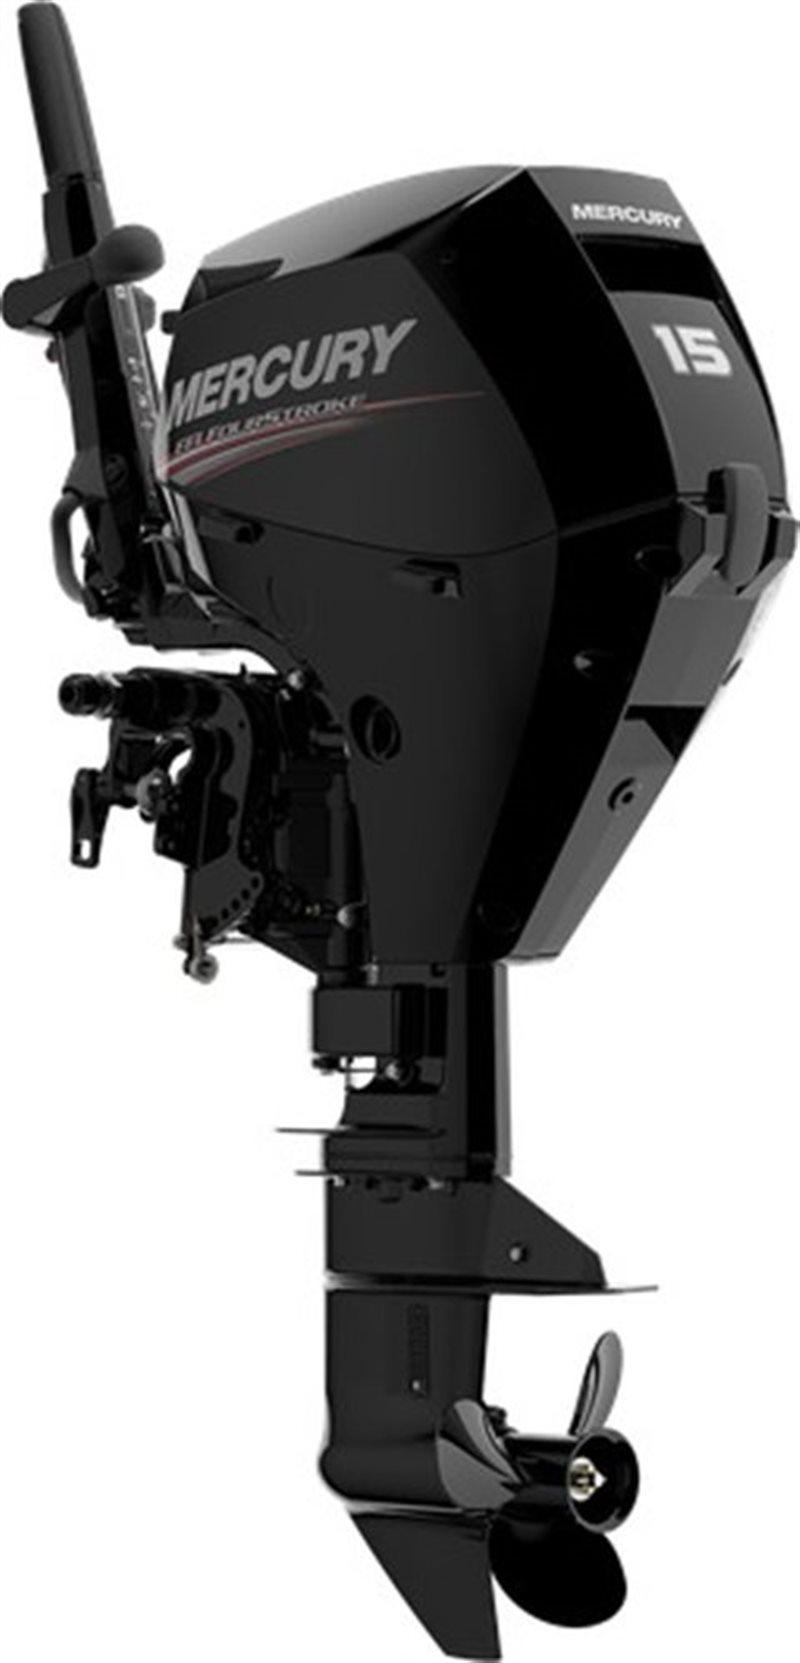 2021 Mercury Outboard FourStroke 15-20 hp 15 EFI Prokicker at Pharo Marine, Waunakee, WI 53597